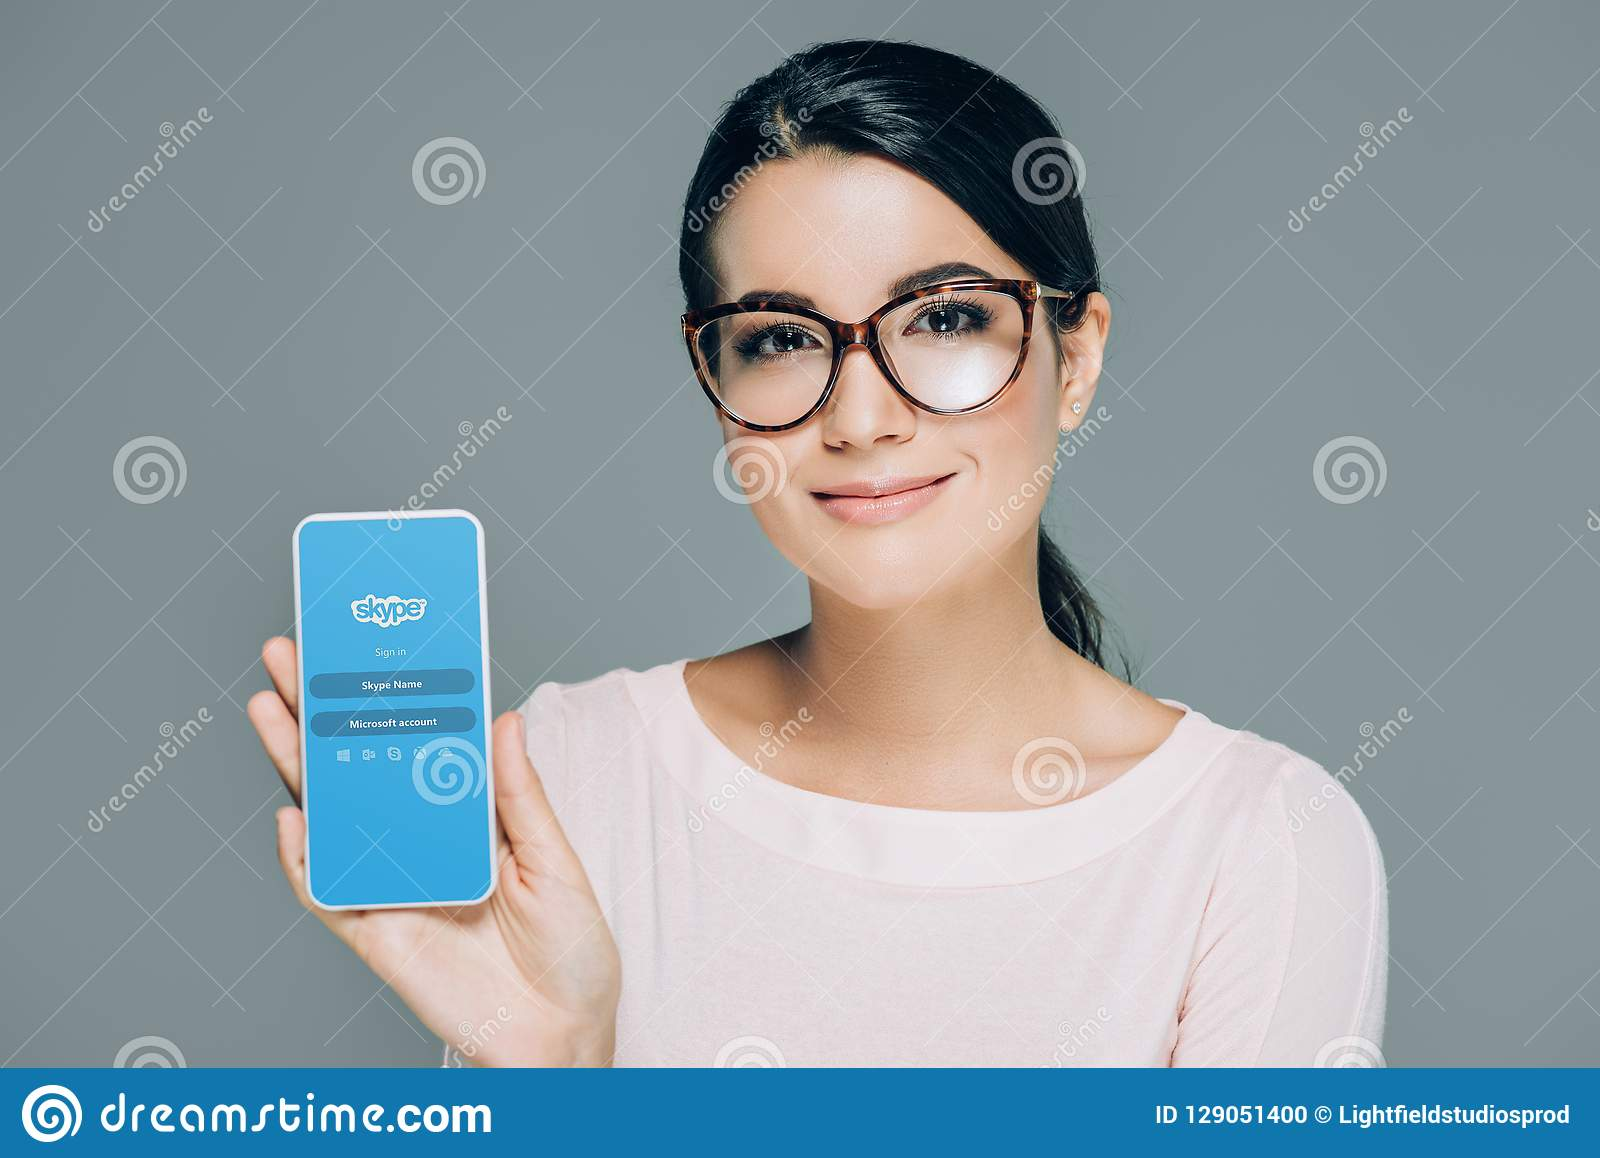 skype girl id name